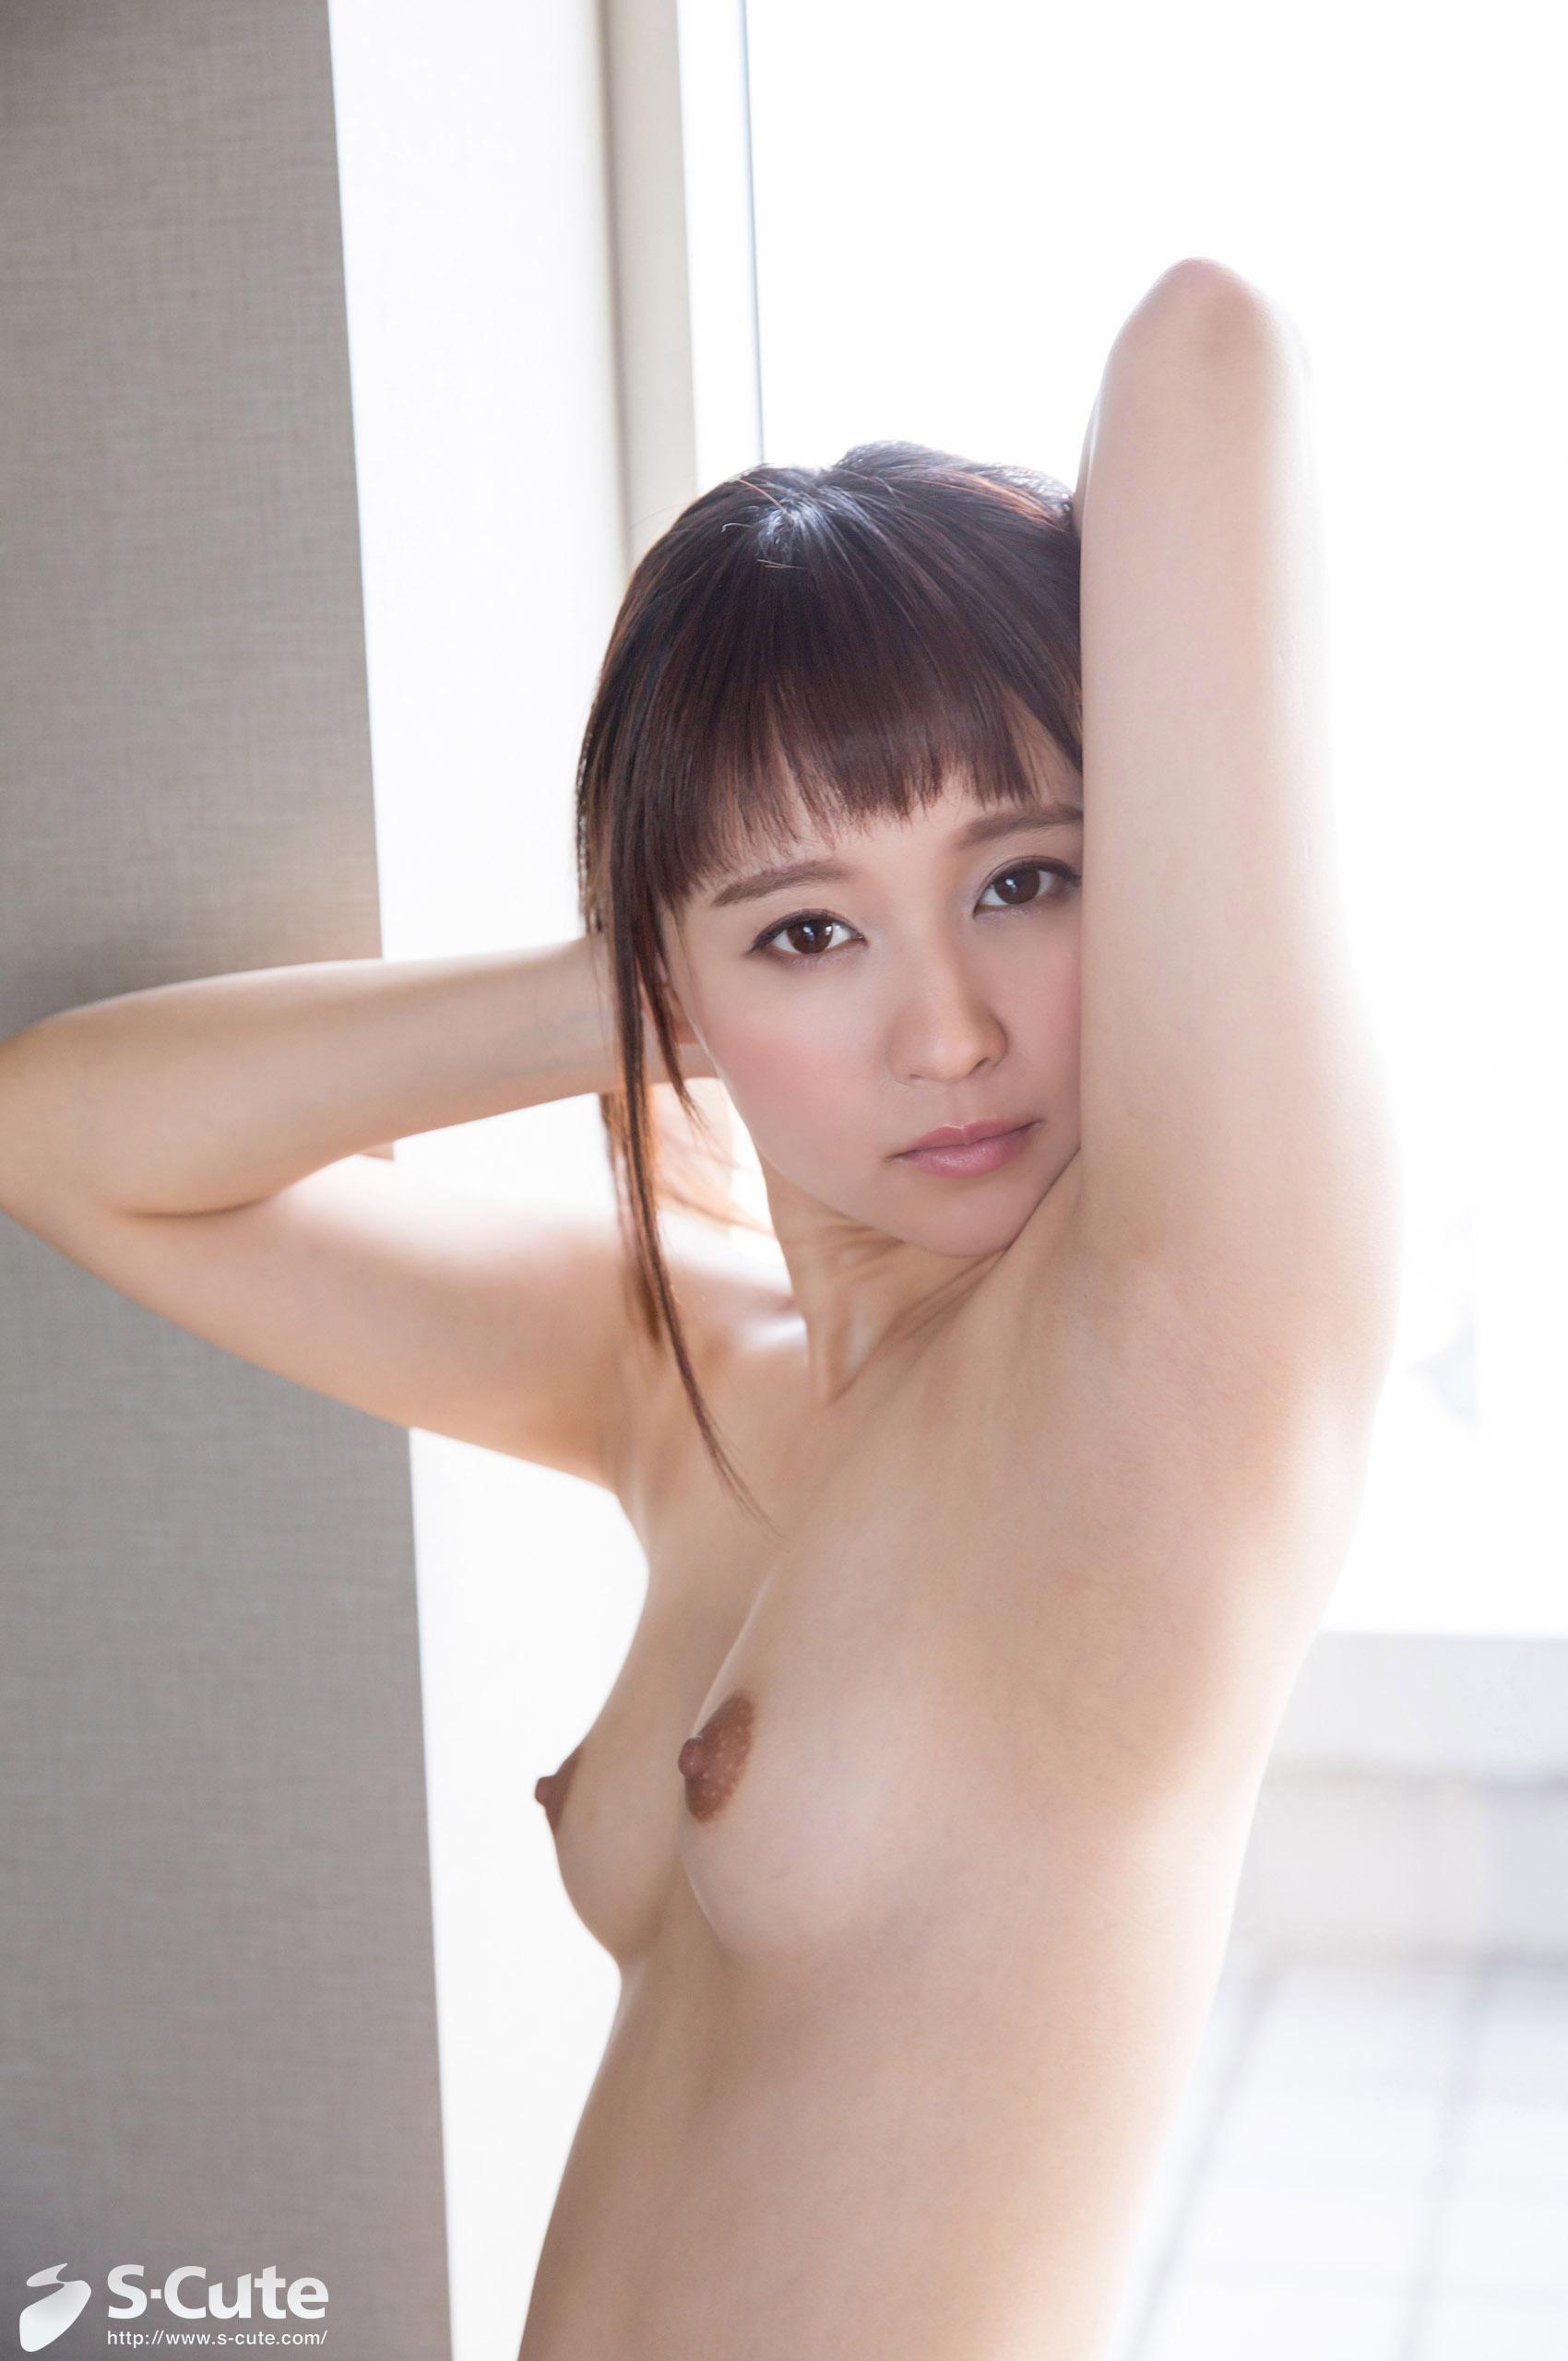 [S-Cute] 2017-03-18 498 Yura #2 全身で感じるH、ぬくもり感じるH [53P27MB]Real Street Angels